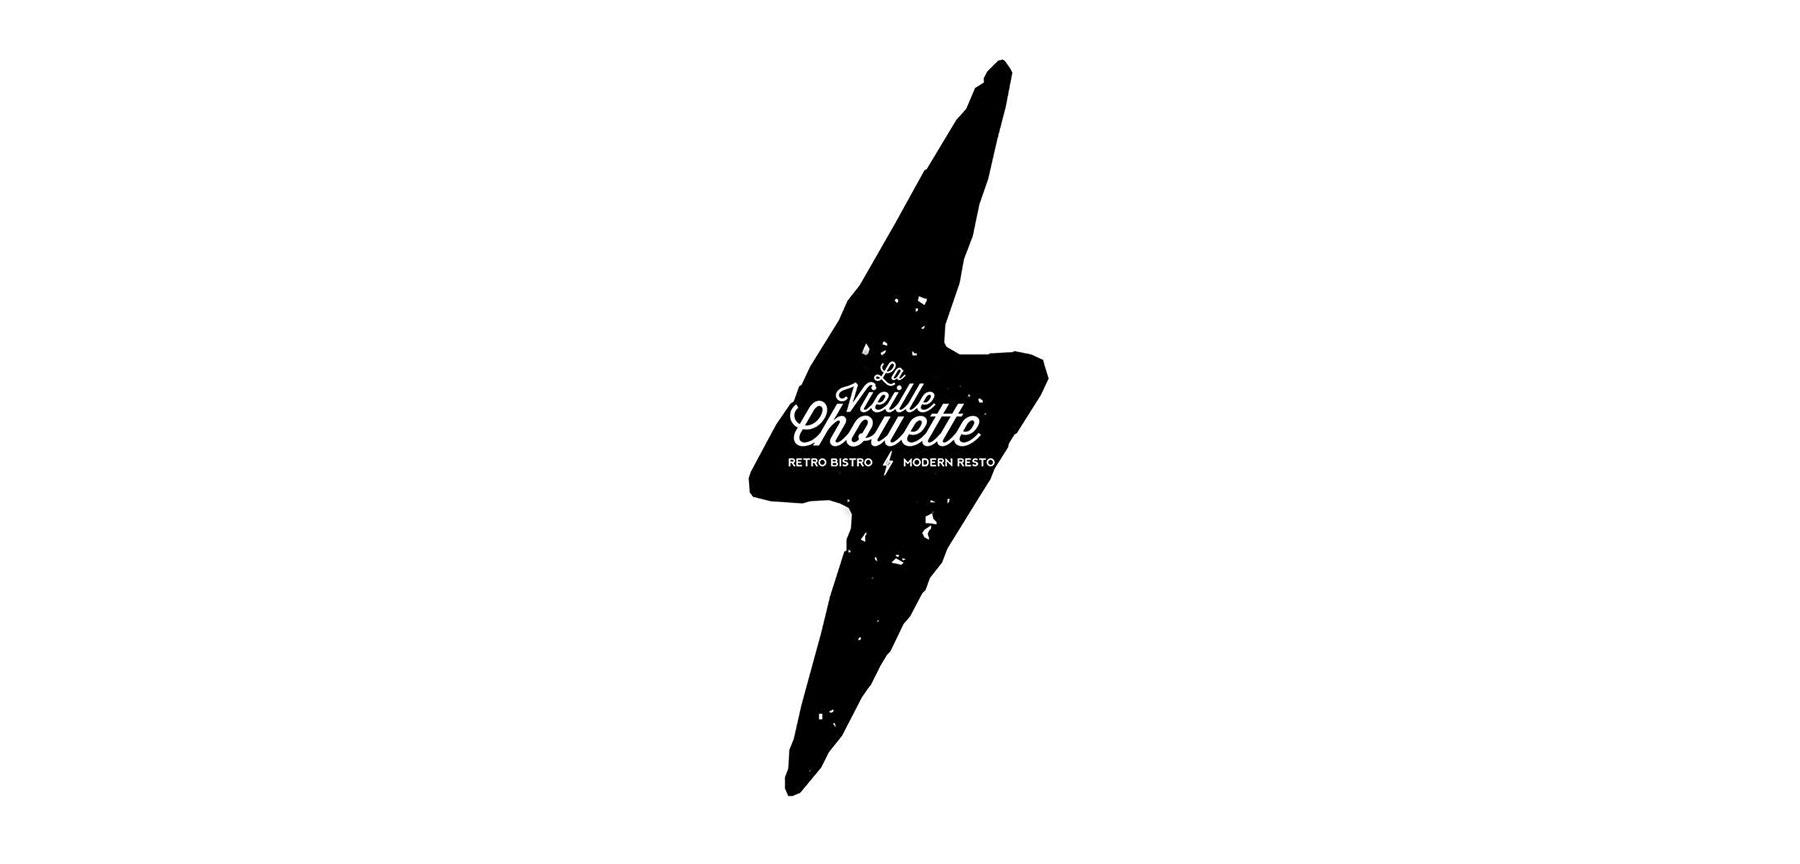 logo-vieille-chouette